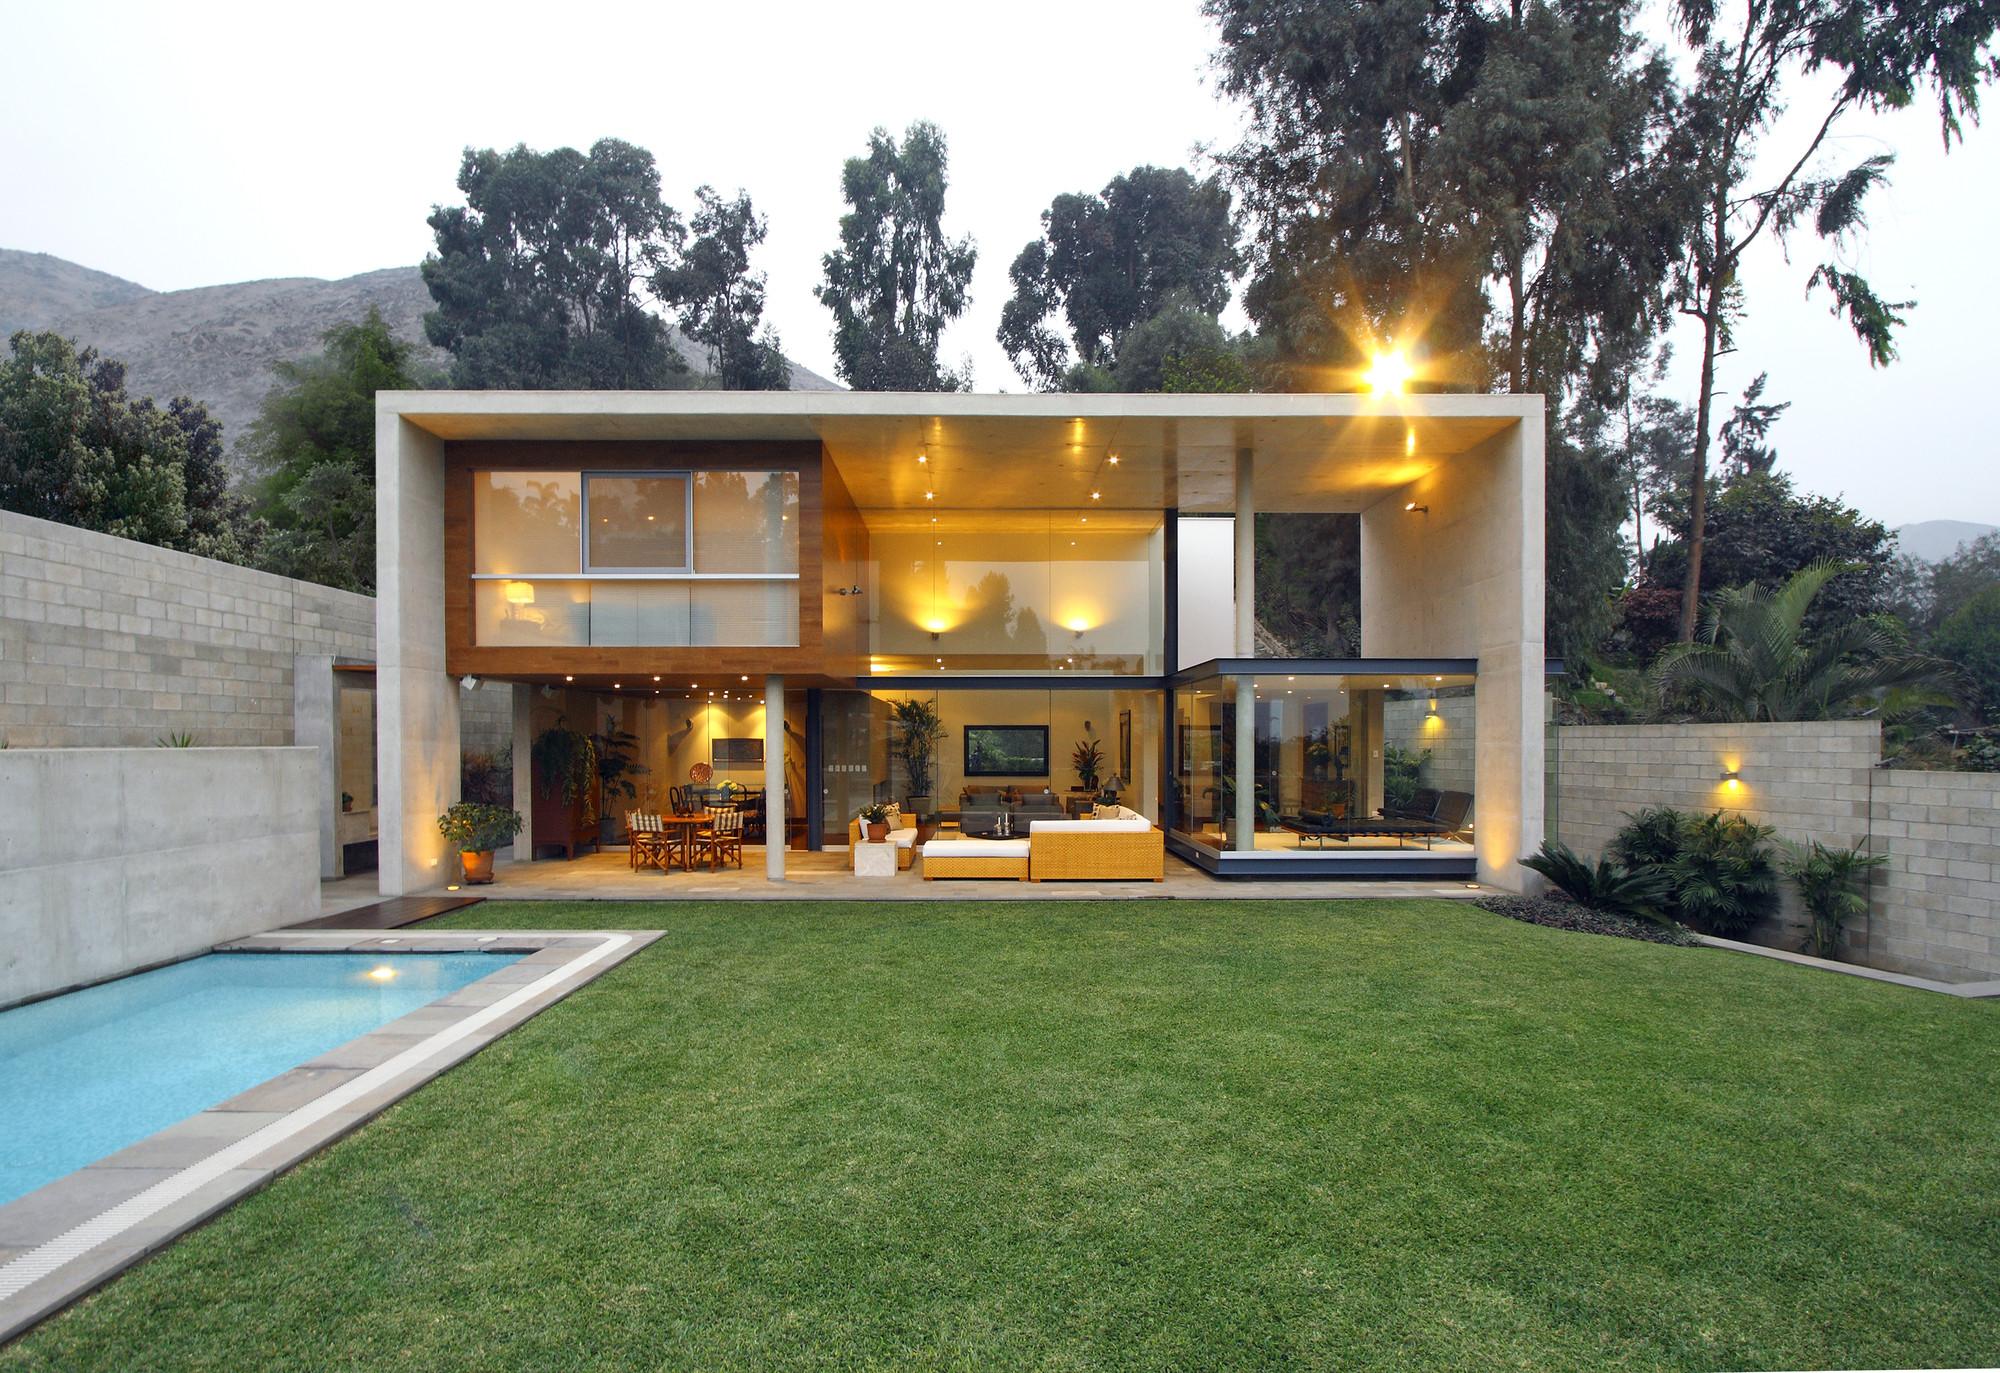 S House / Domenack Arquitectos, © Juan Solano